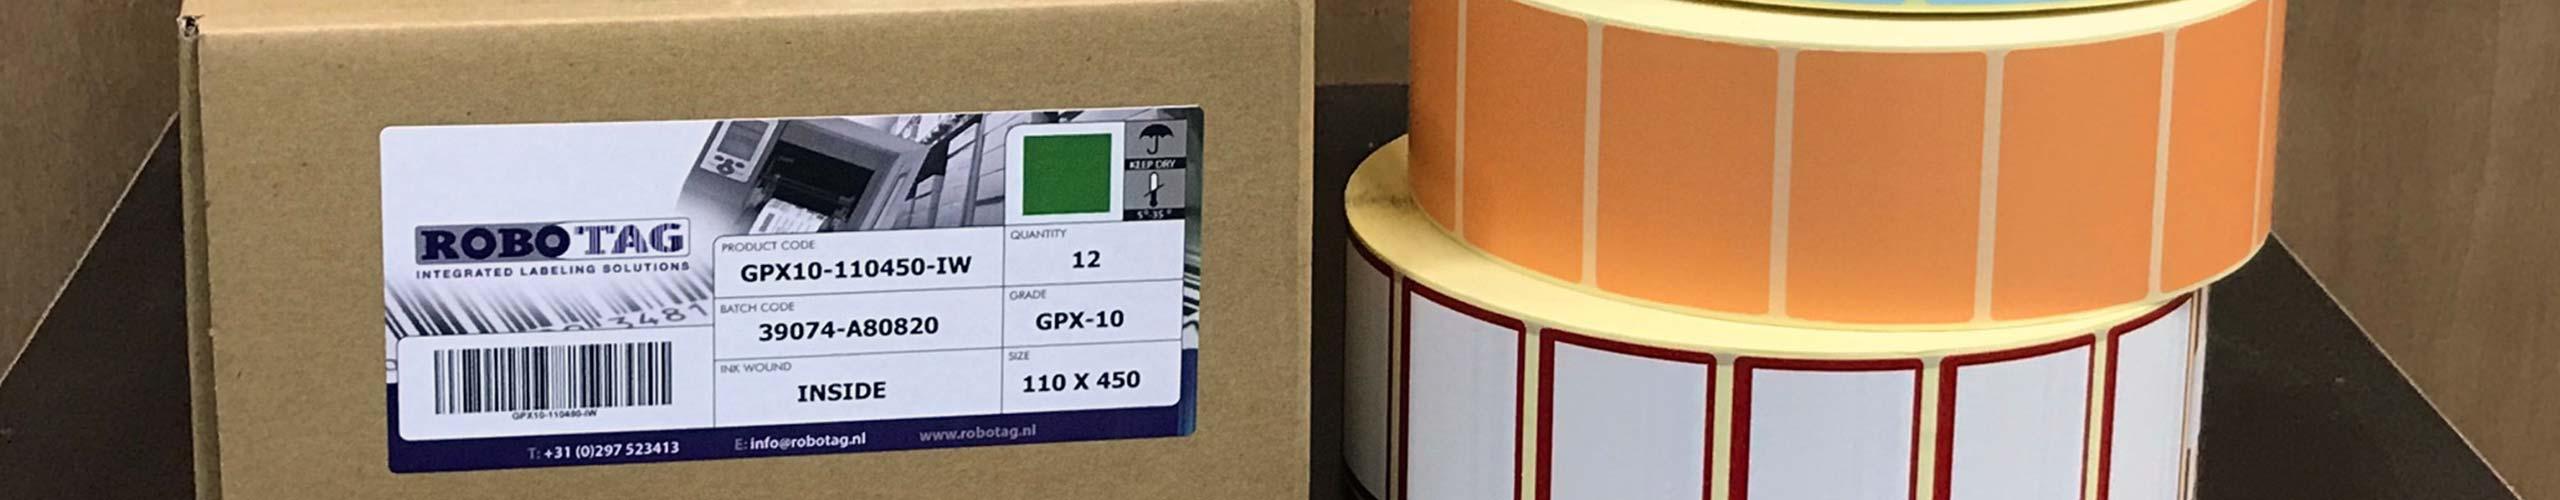 Robotag hoezen en etiketten los